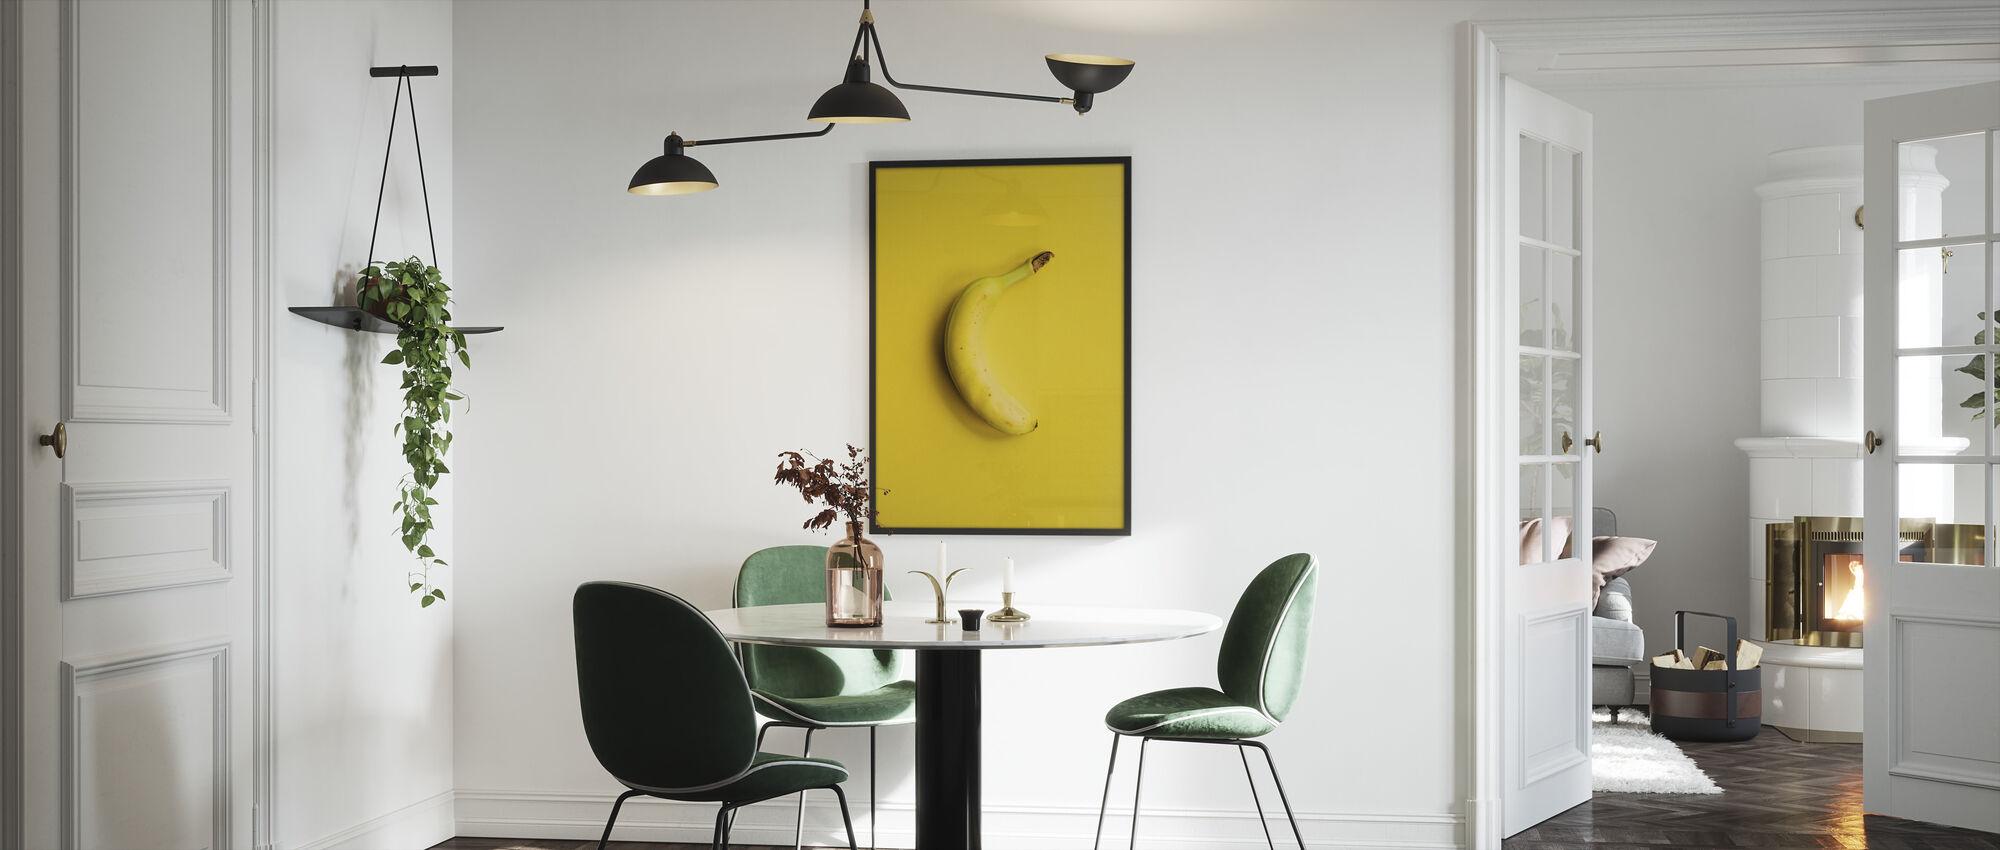 Yellow Banana - Framed print - Kitchen